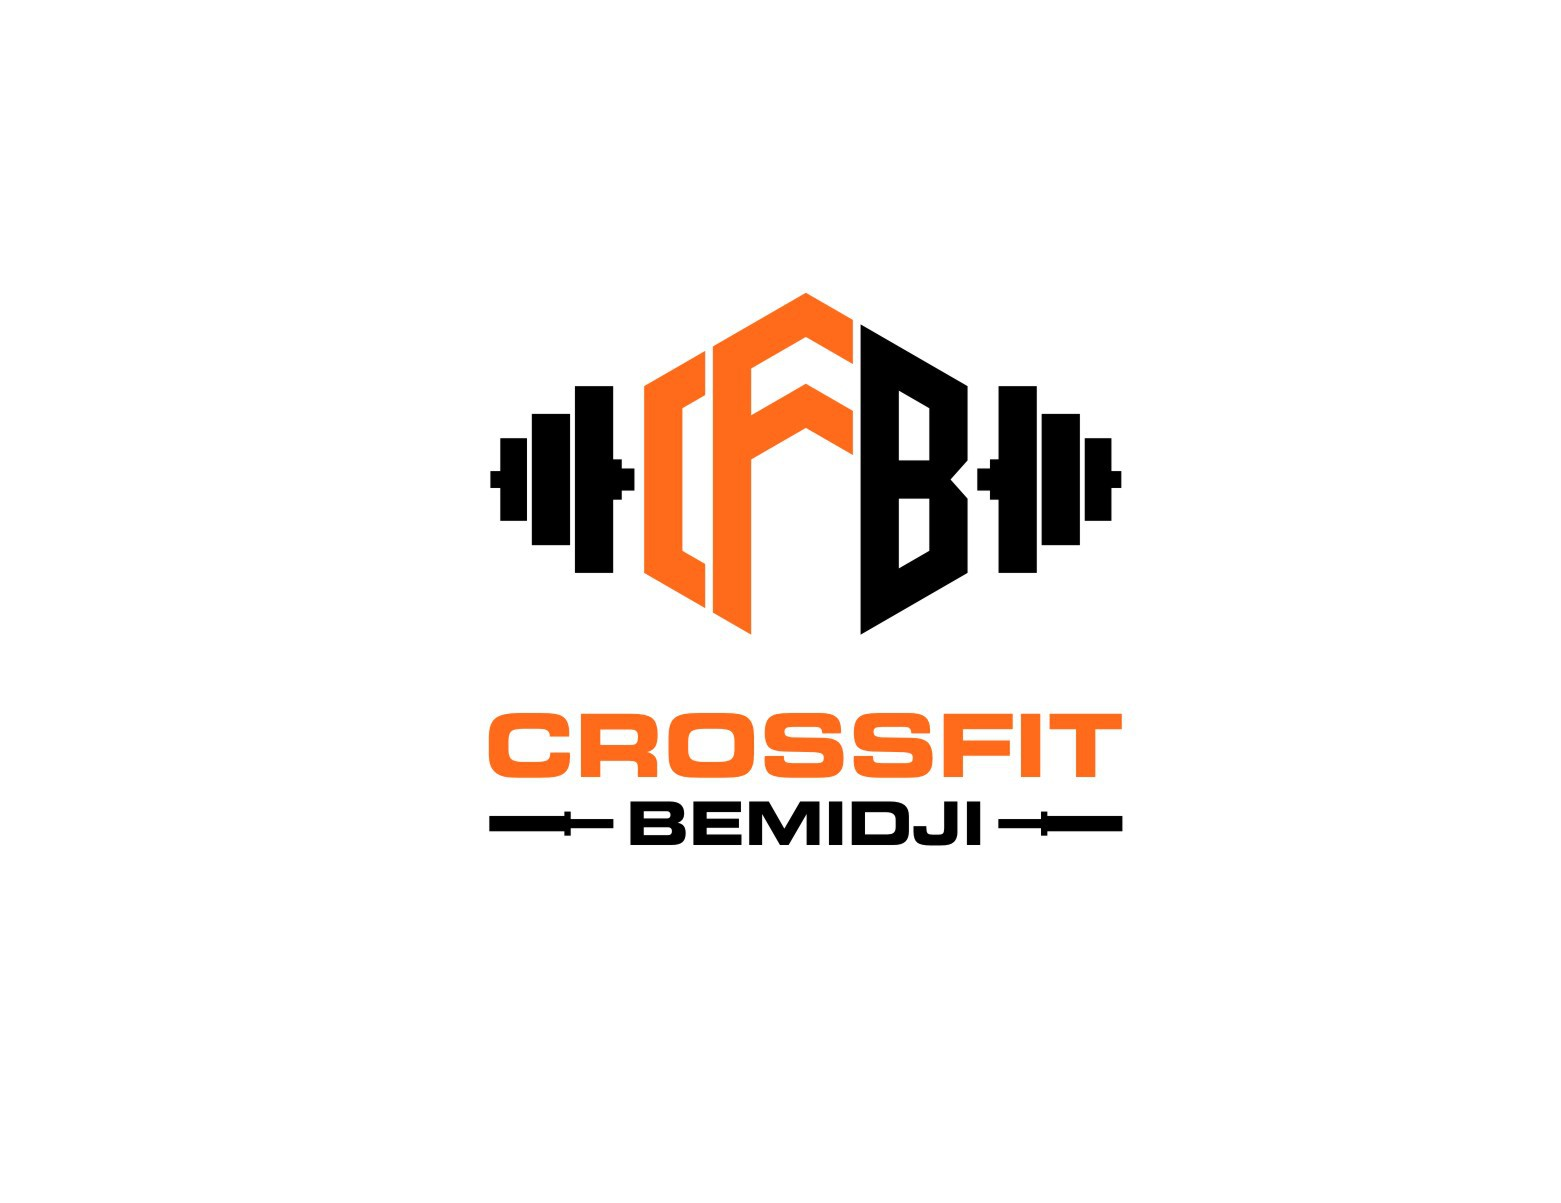 CrossFit Bemidji needs a powerful new logo